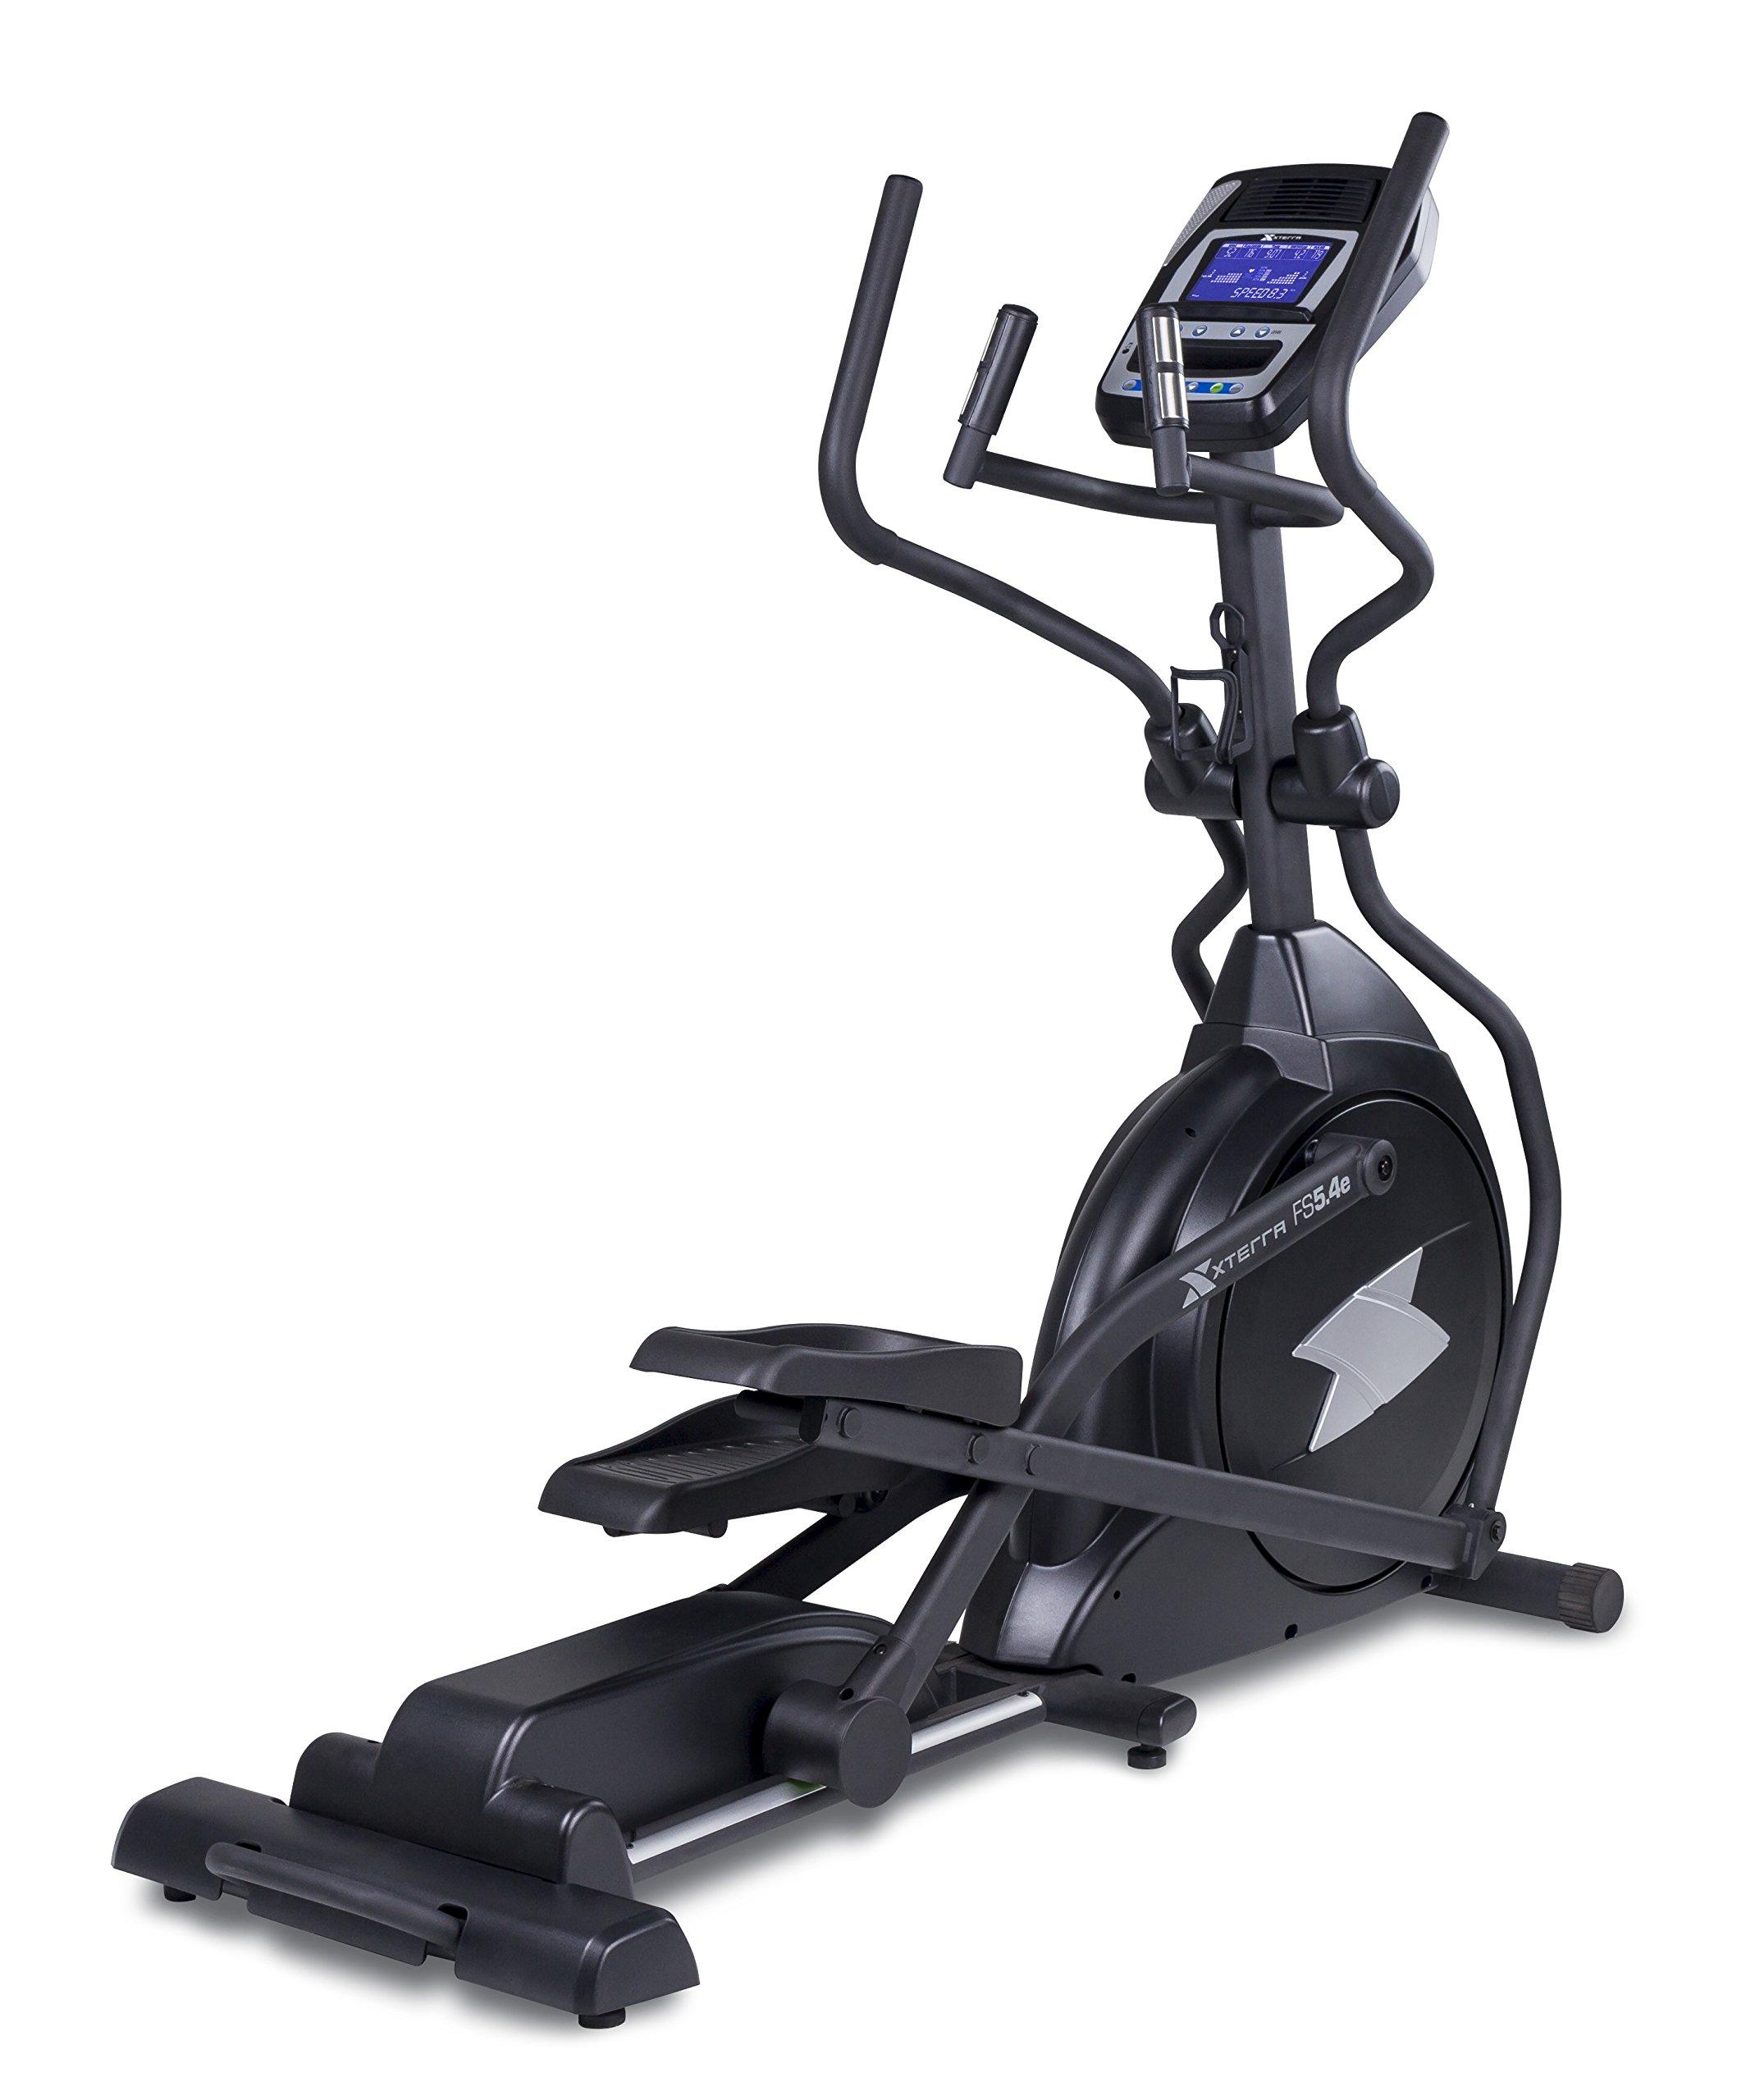 Xterra Fitness FS5.4e Elliptical Trainer, Black